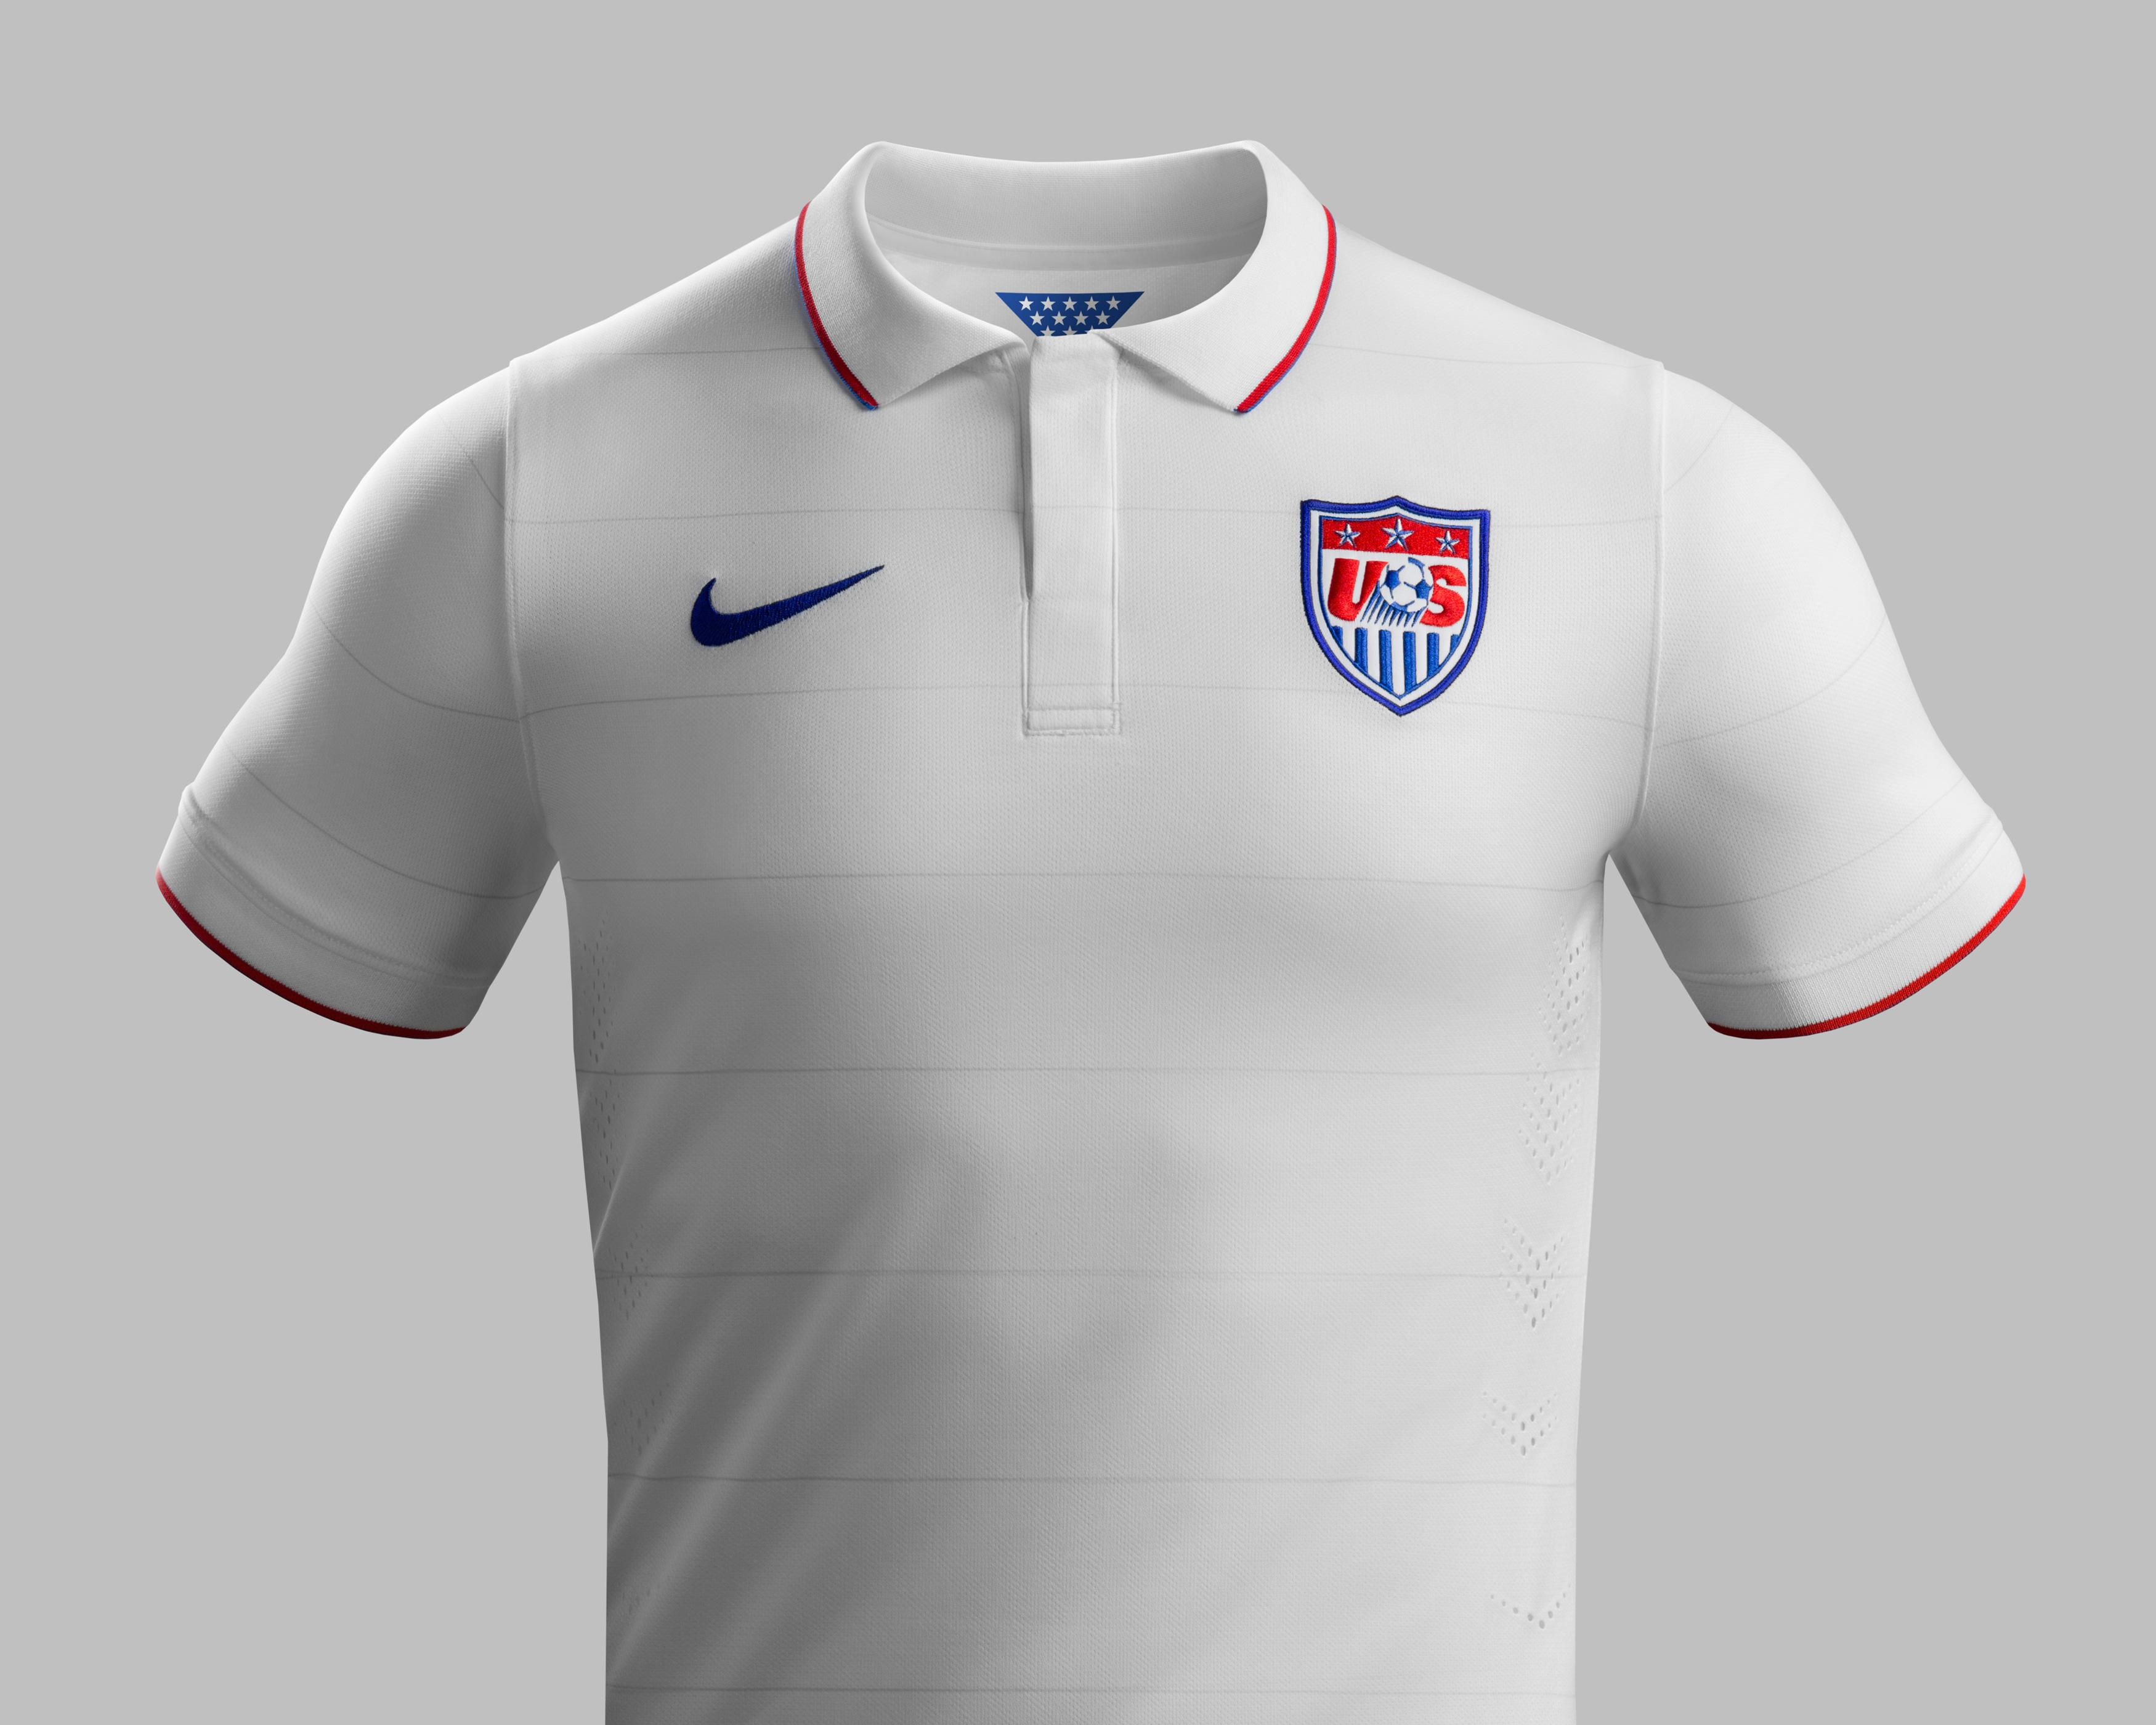 U.S. reveals 2014 World Cup jersey, and it looks like a polo shirt ...